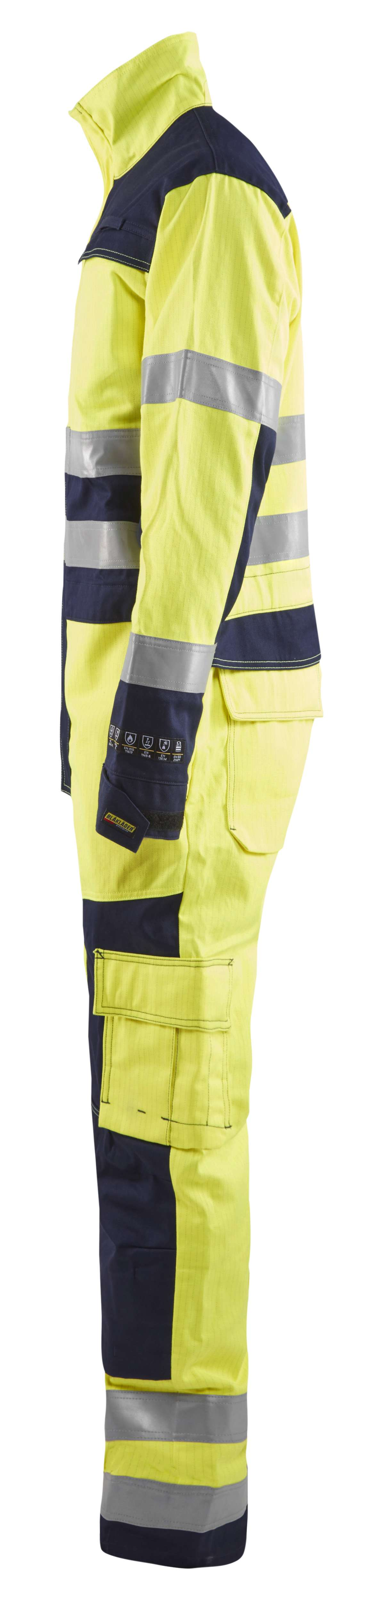 Blaklader Overalls 63781514 Multinorm geel-marineblauw(3389)